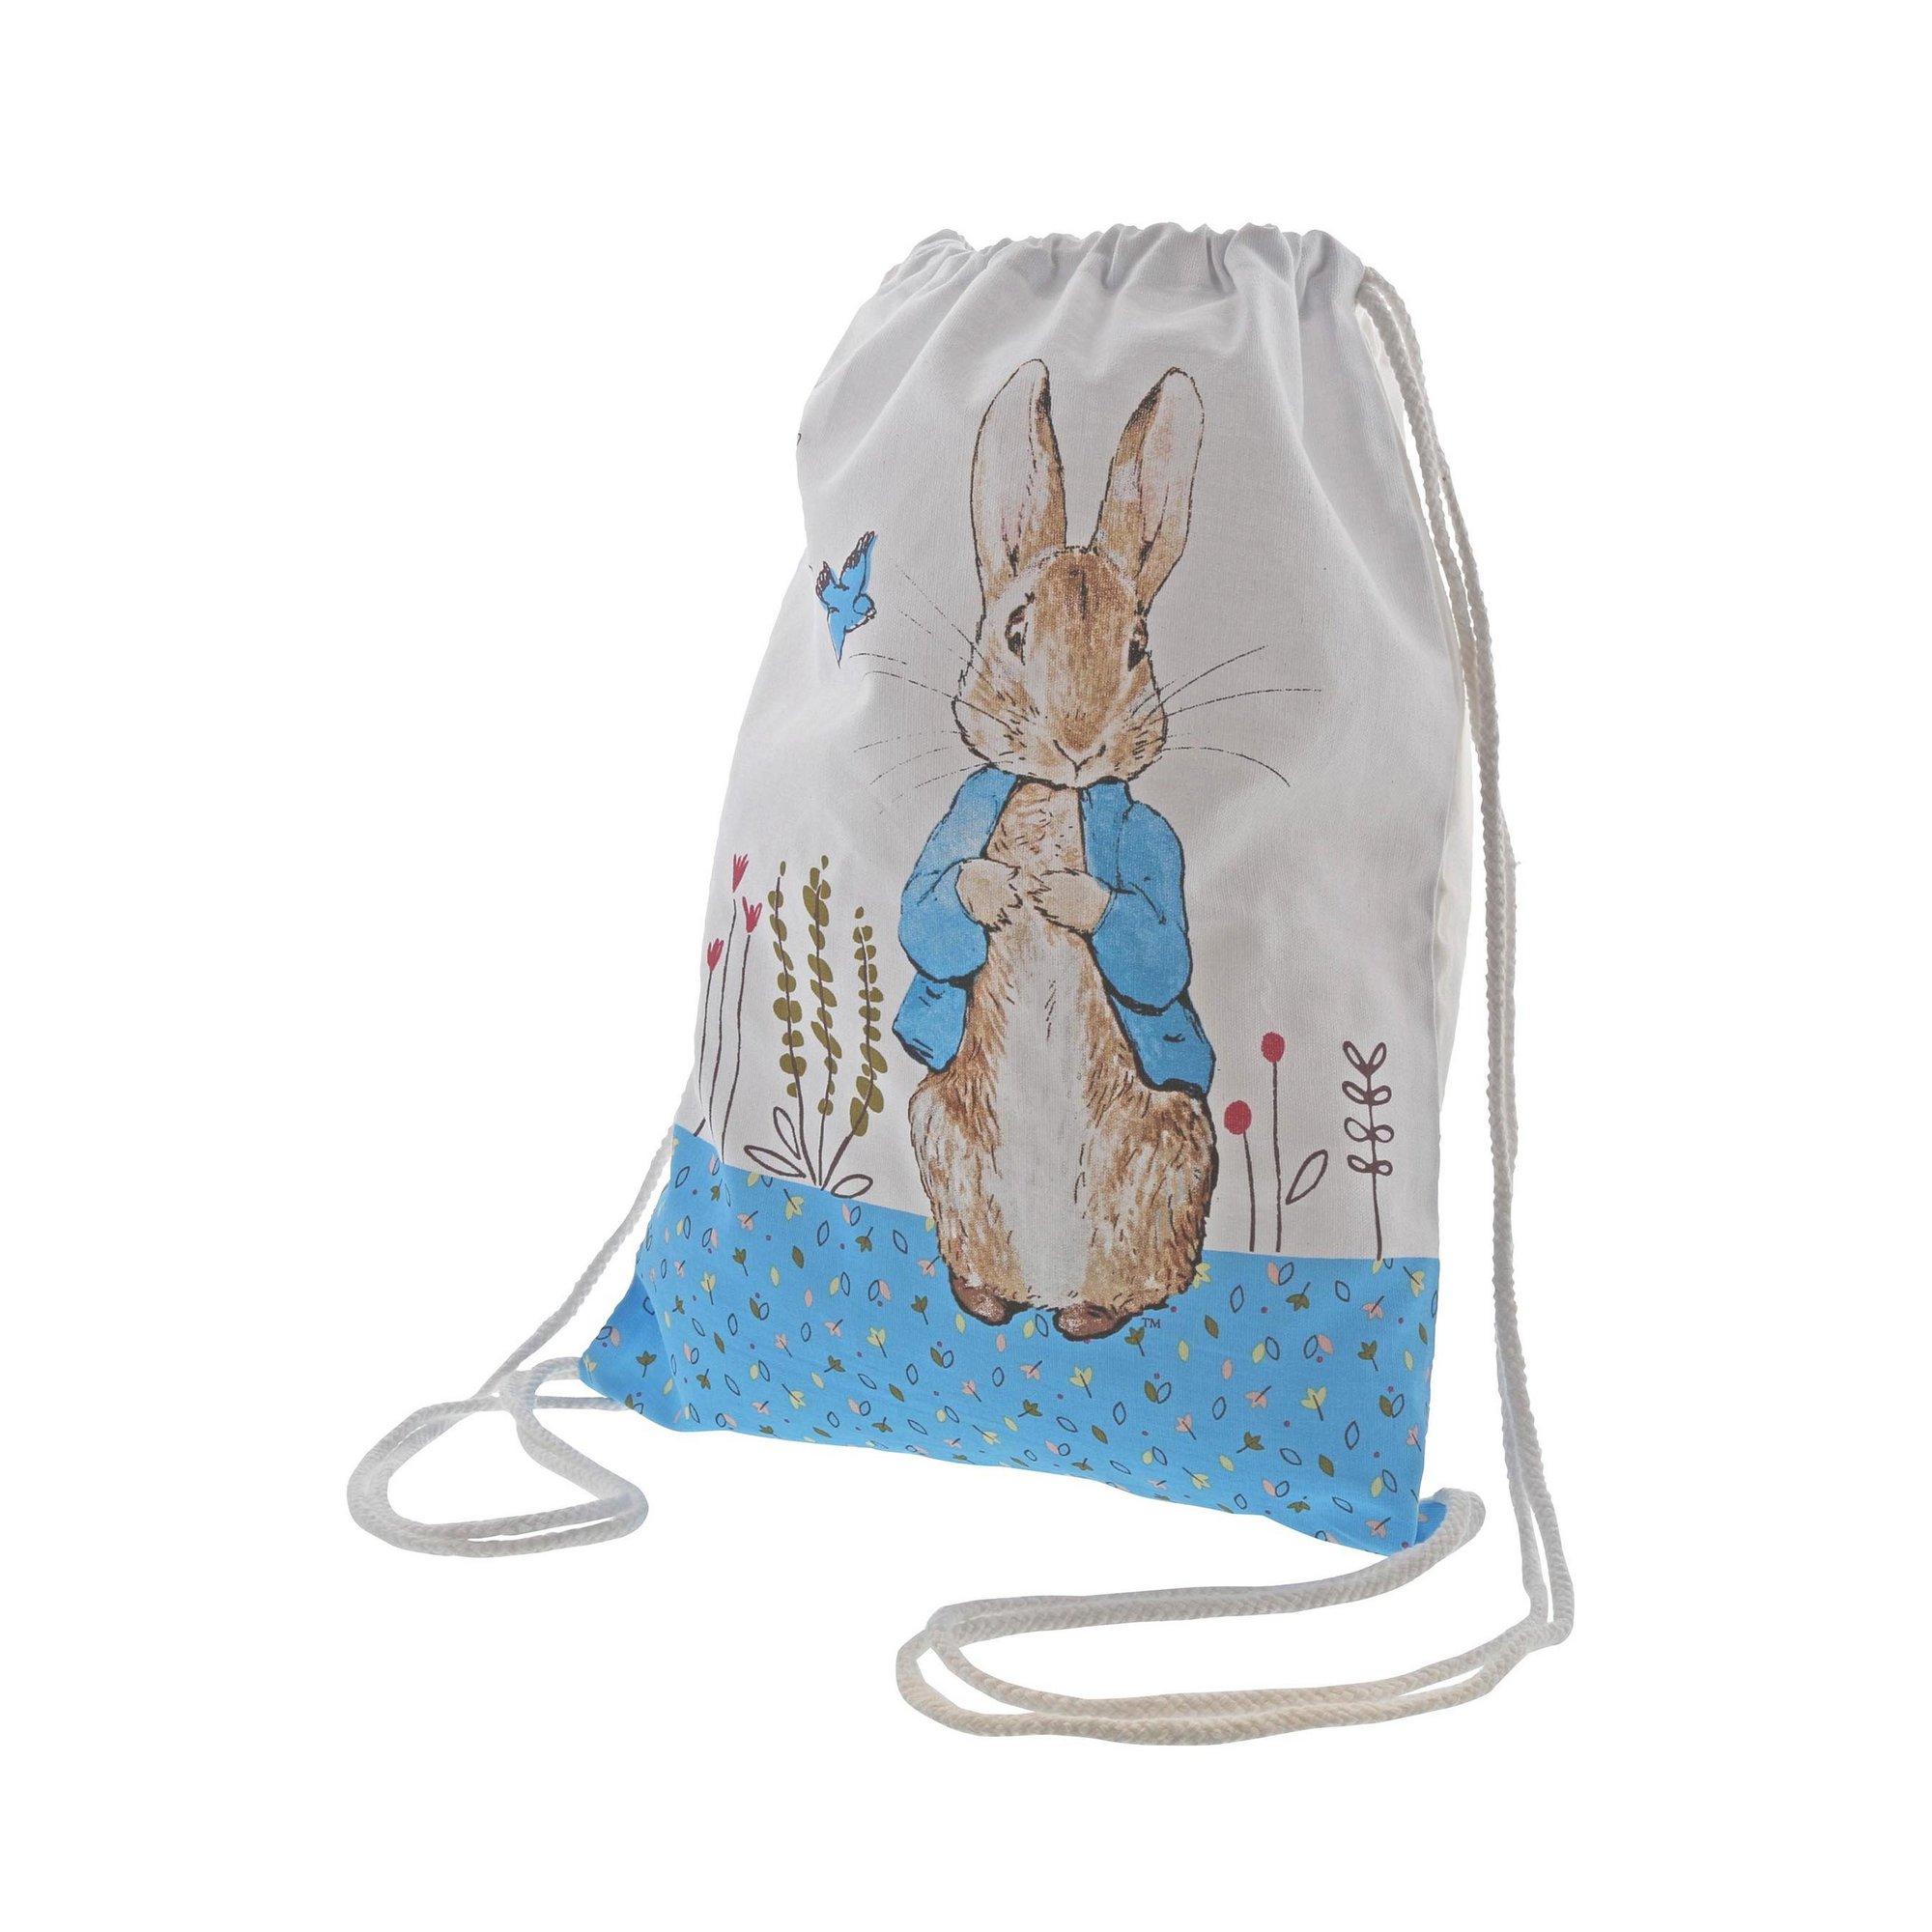 Image of Beatrix Potter Peter Rabbit Drawstring Bag